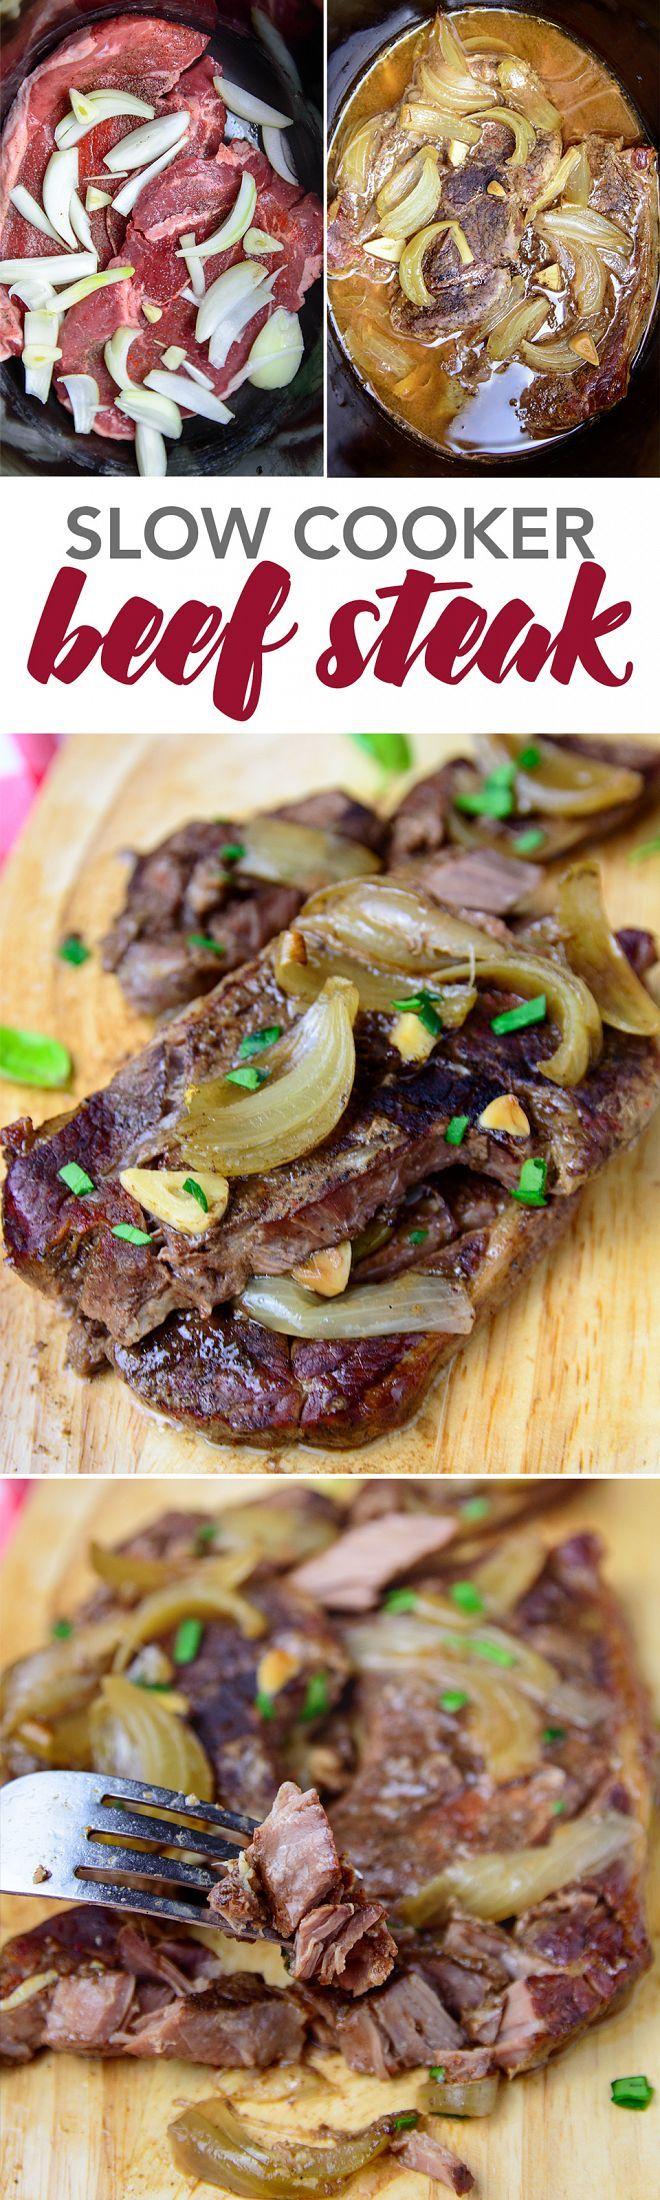 Slow Cooker Beef Steak - My Zucchini Recipes